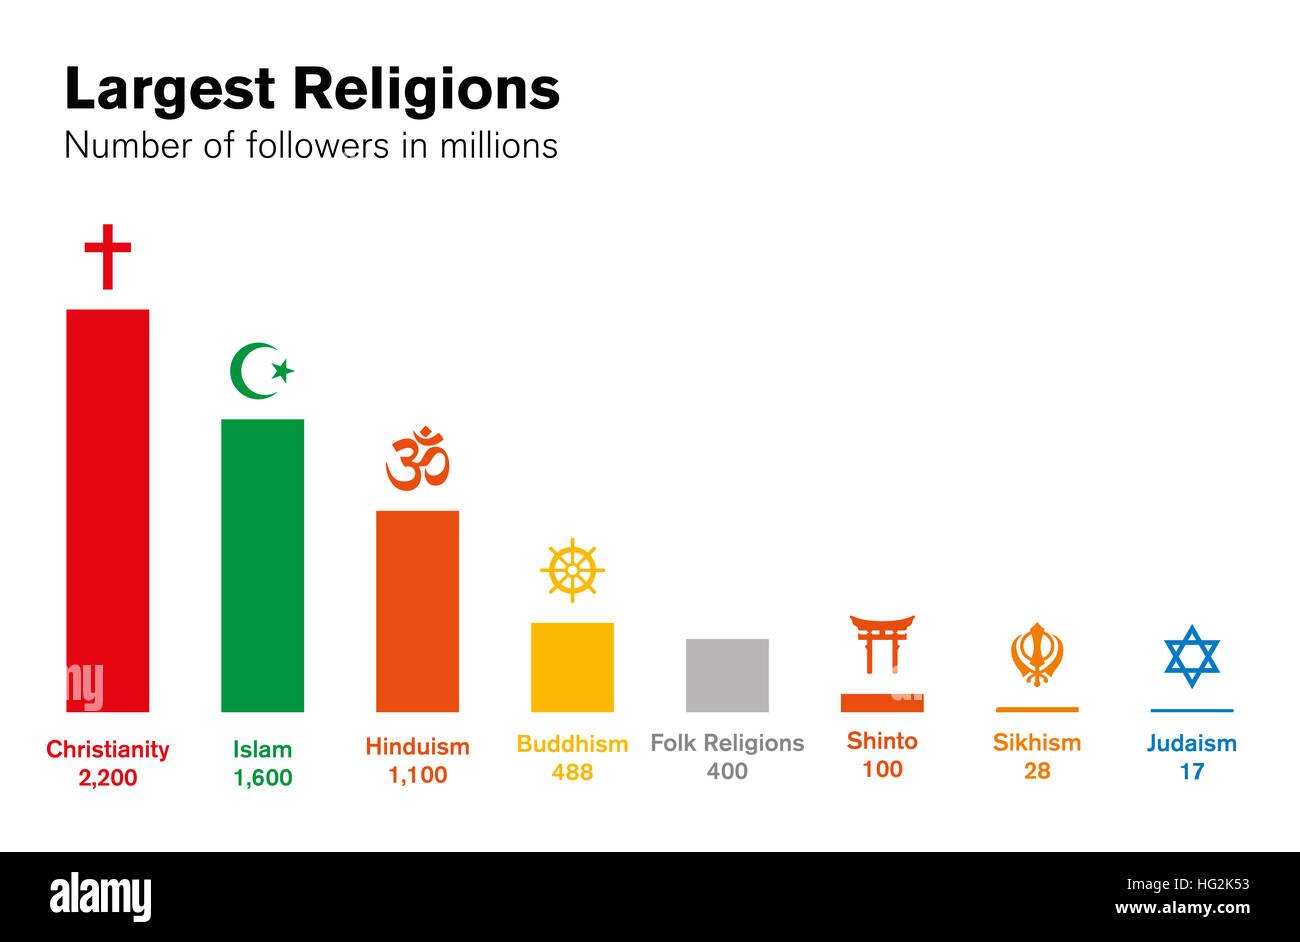 a follower of islam